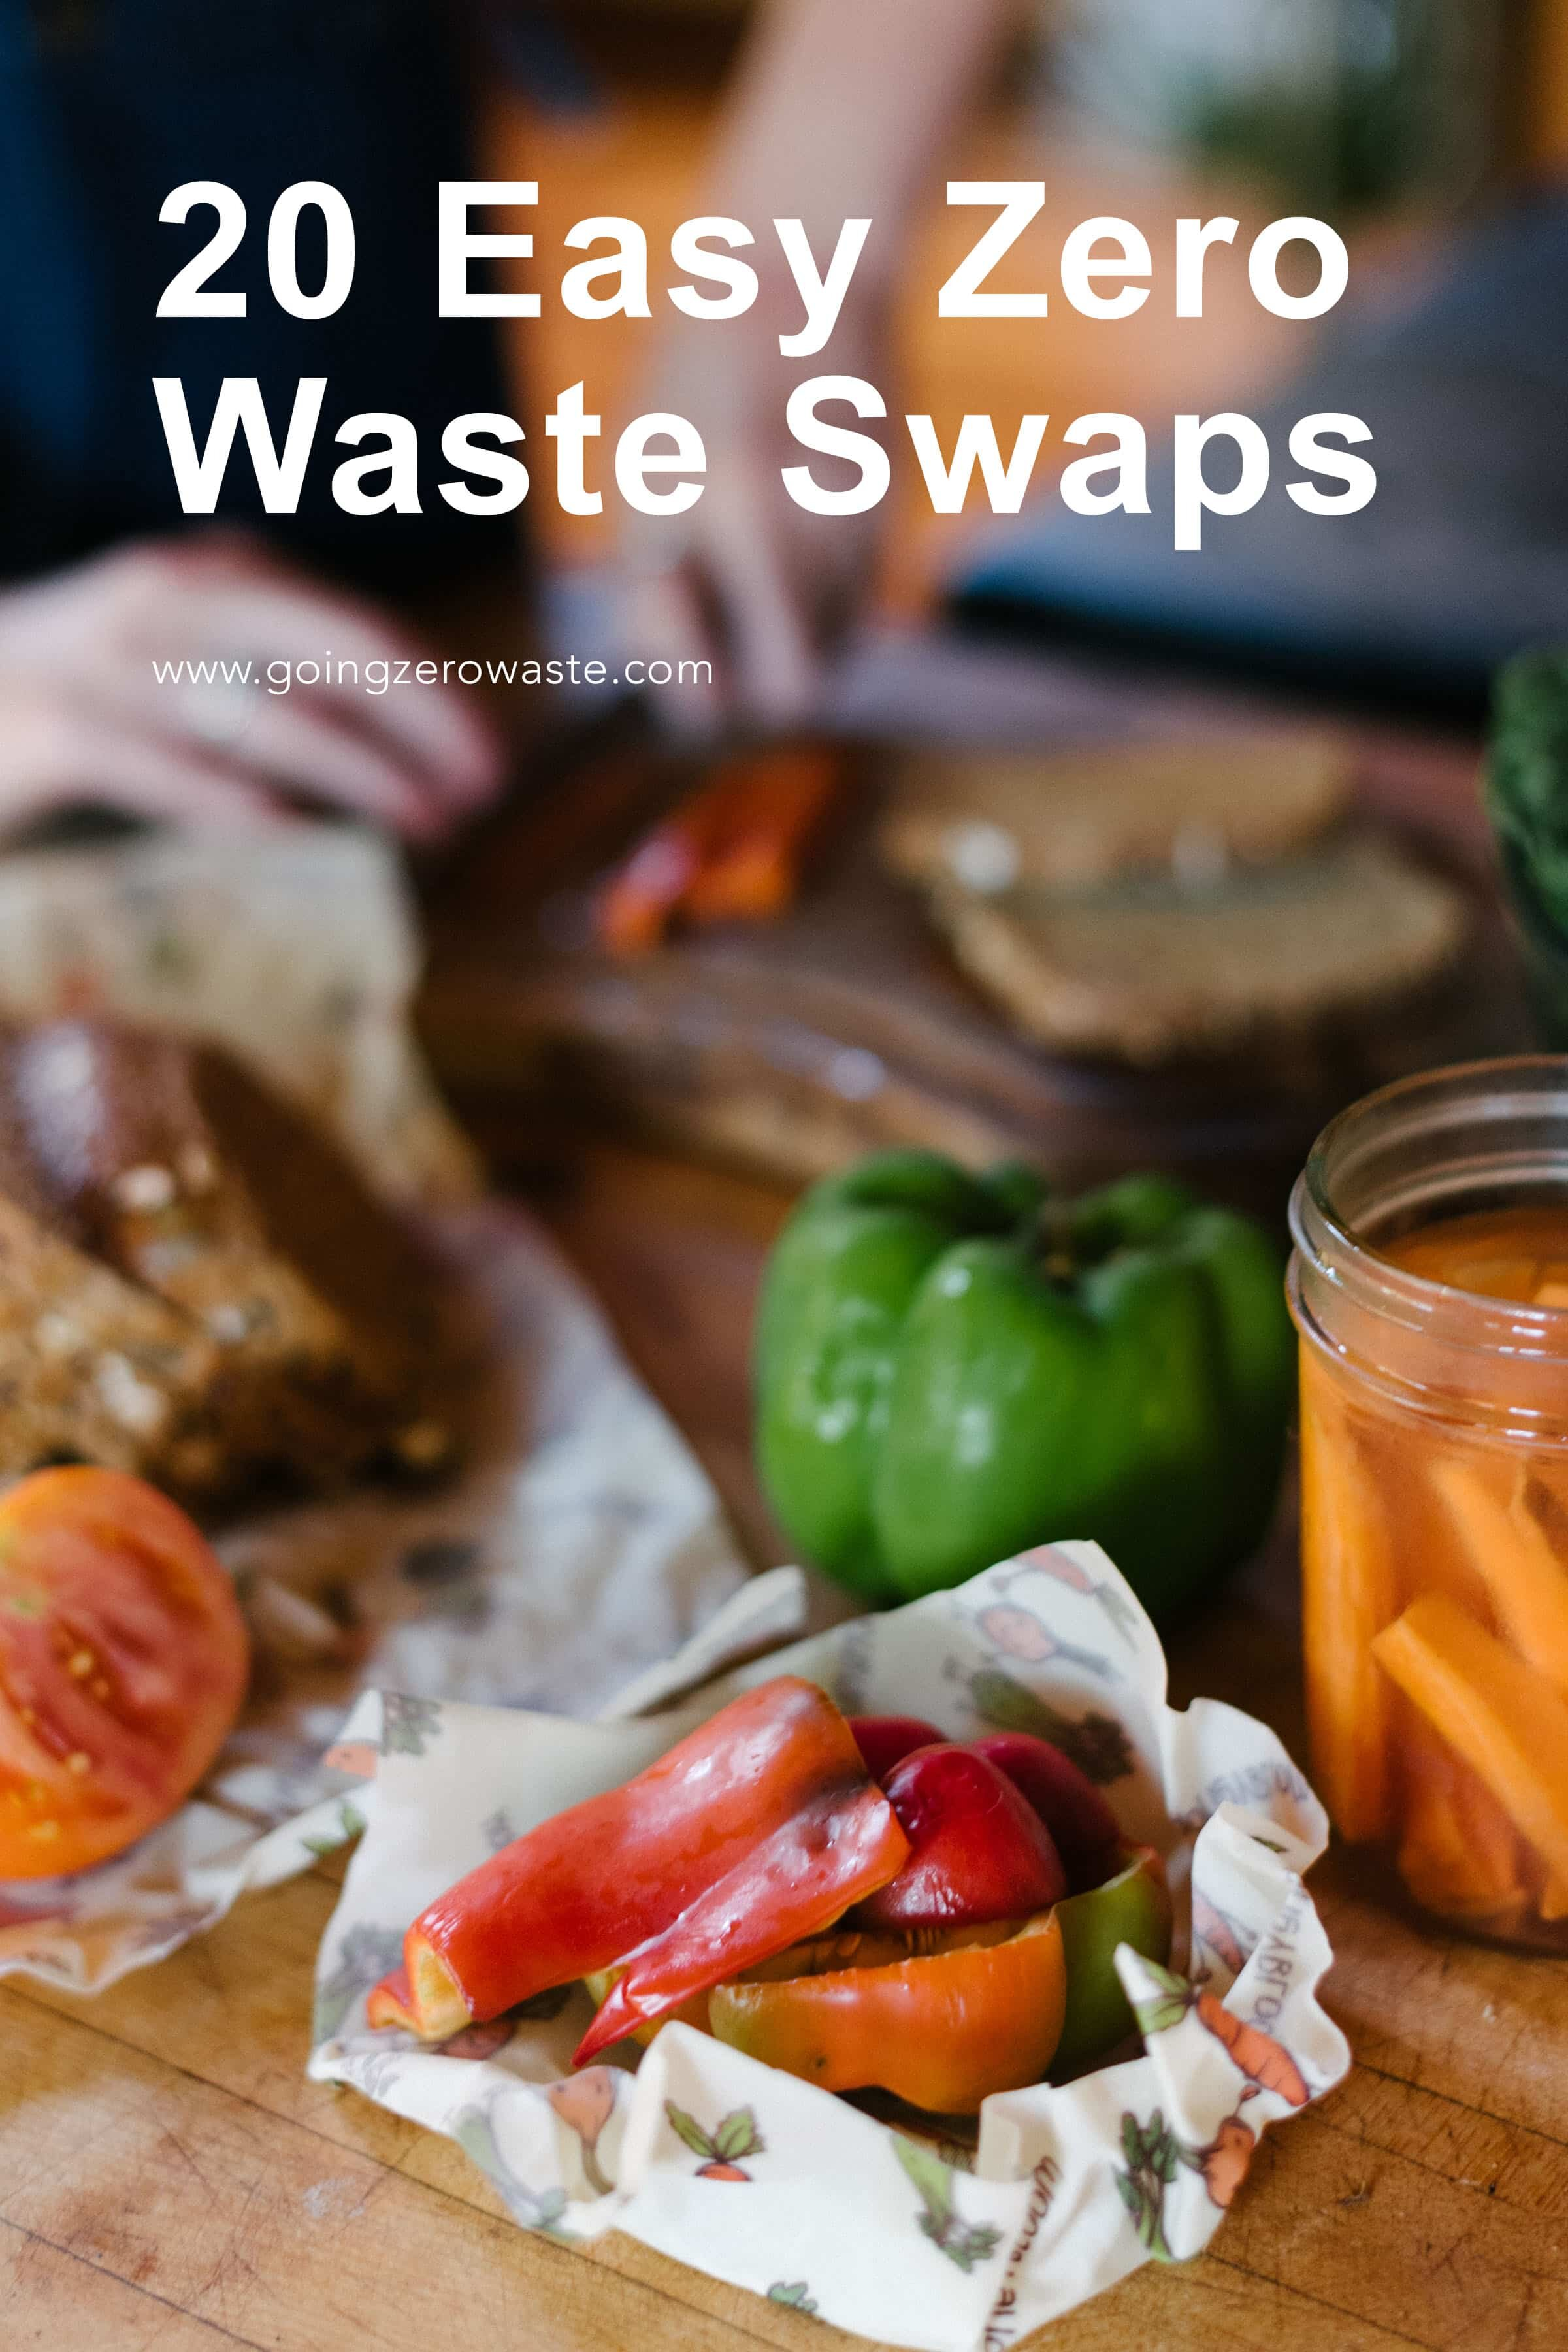 20 easy zero waste swaps from www.goingzerowaste.com #zerowaste #ecofriendly #sustainable #simpleswaps #climatechange #zerowasteswaps